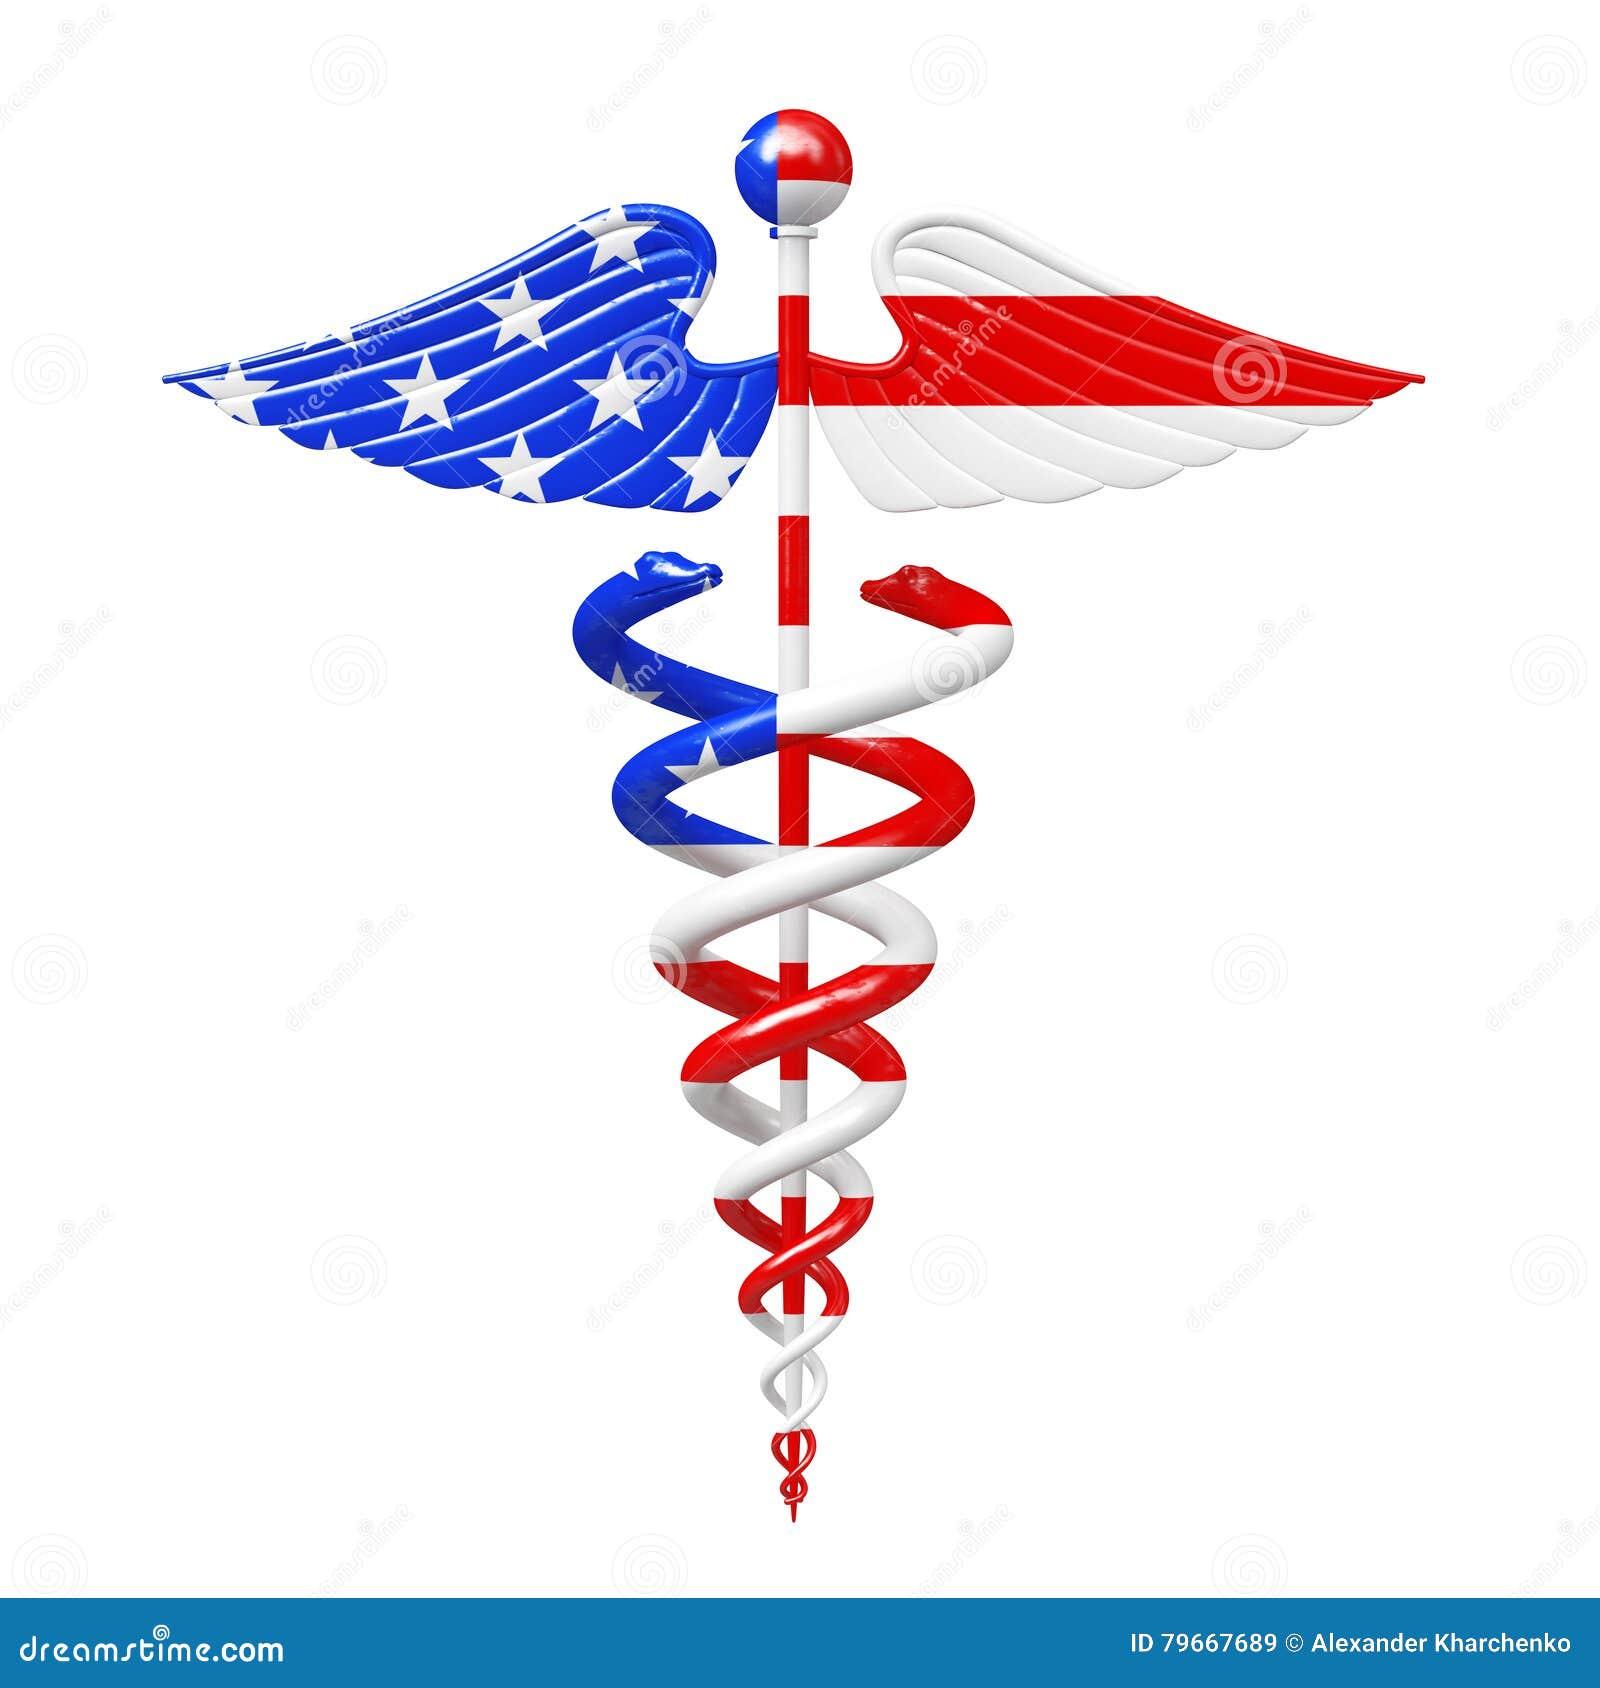 National symbols of the United States